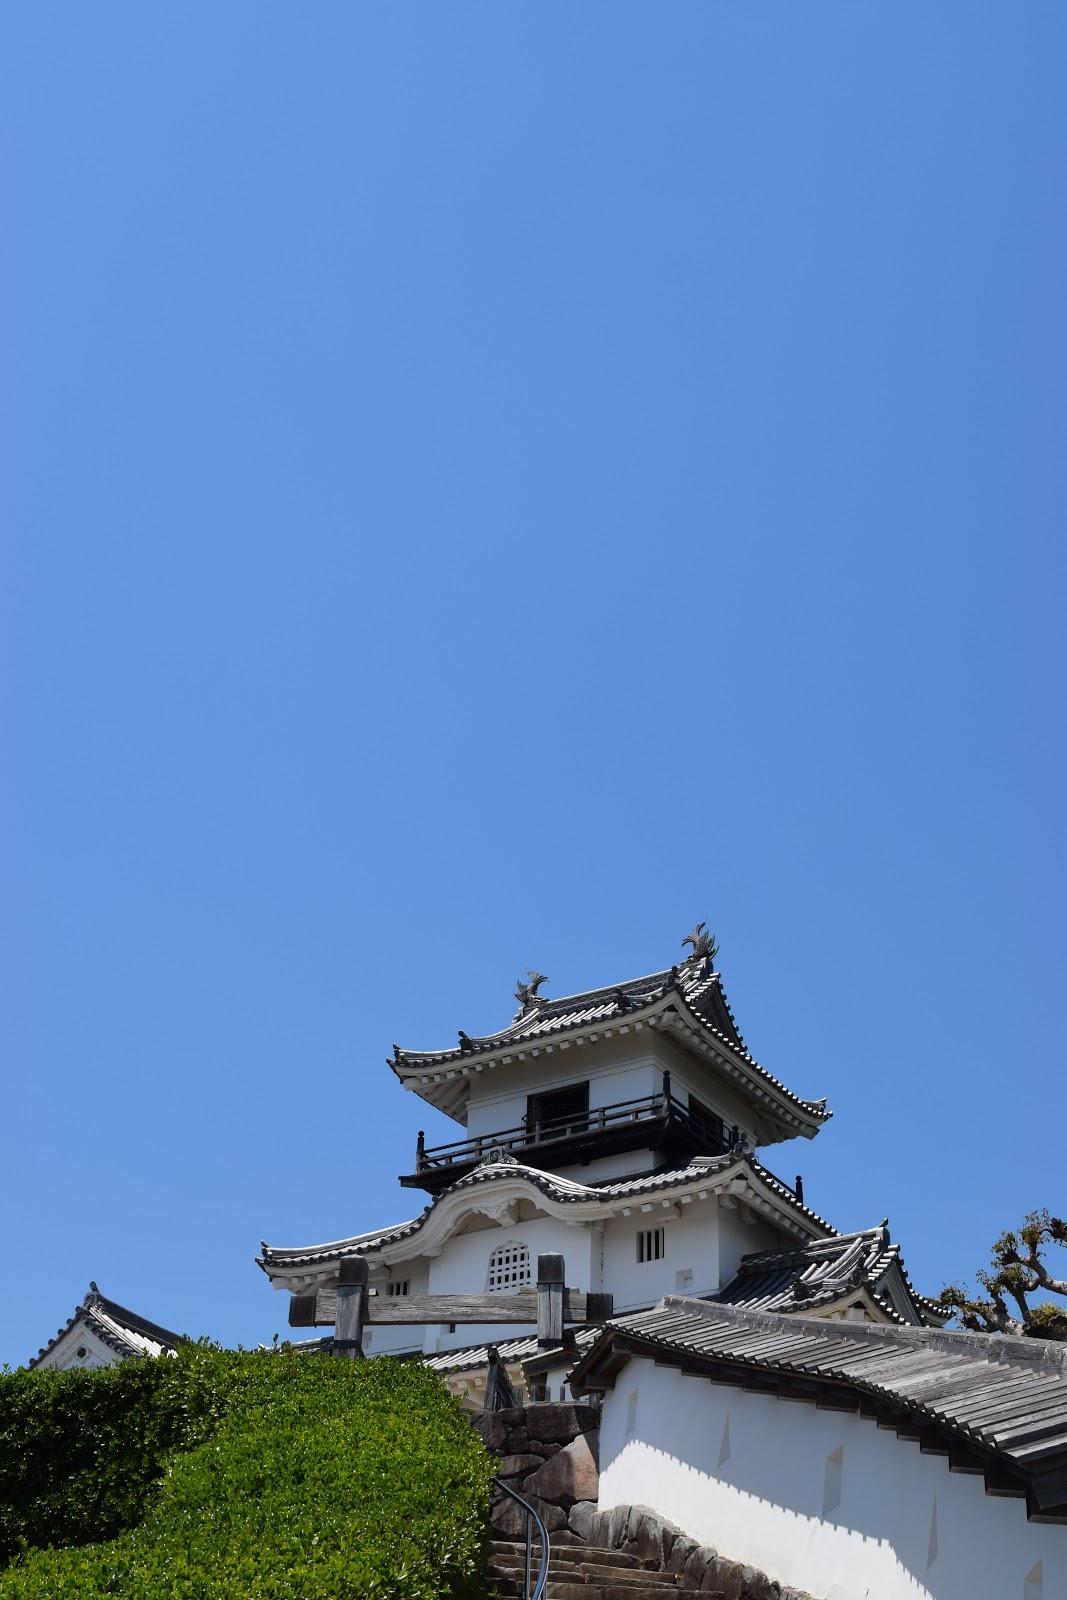 Kakegawa castle, Shizuoka prefecture